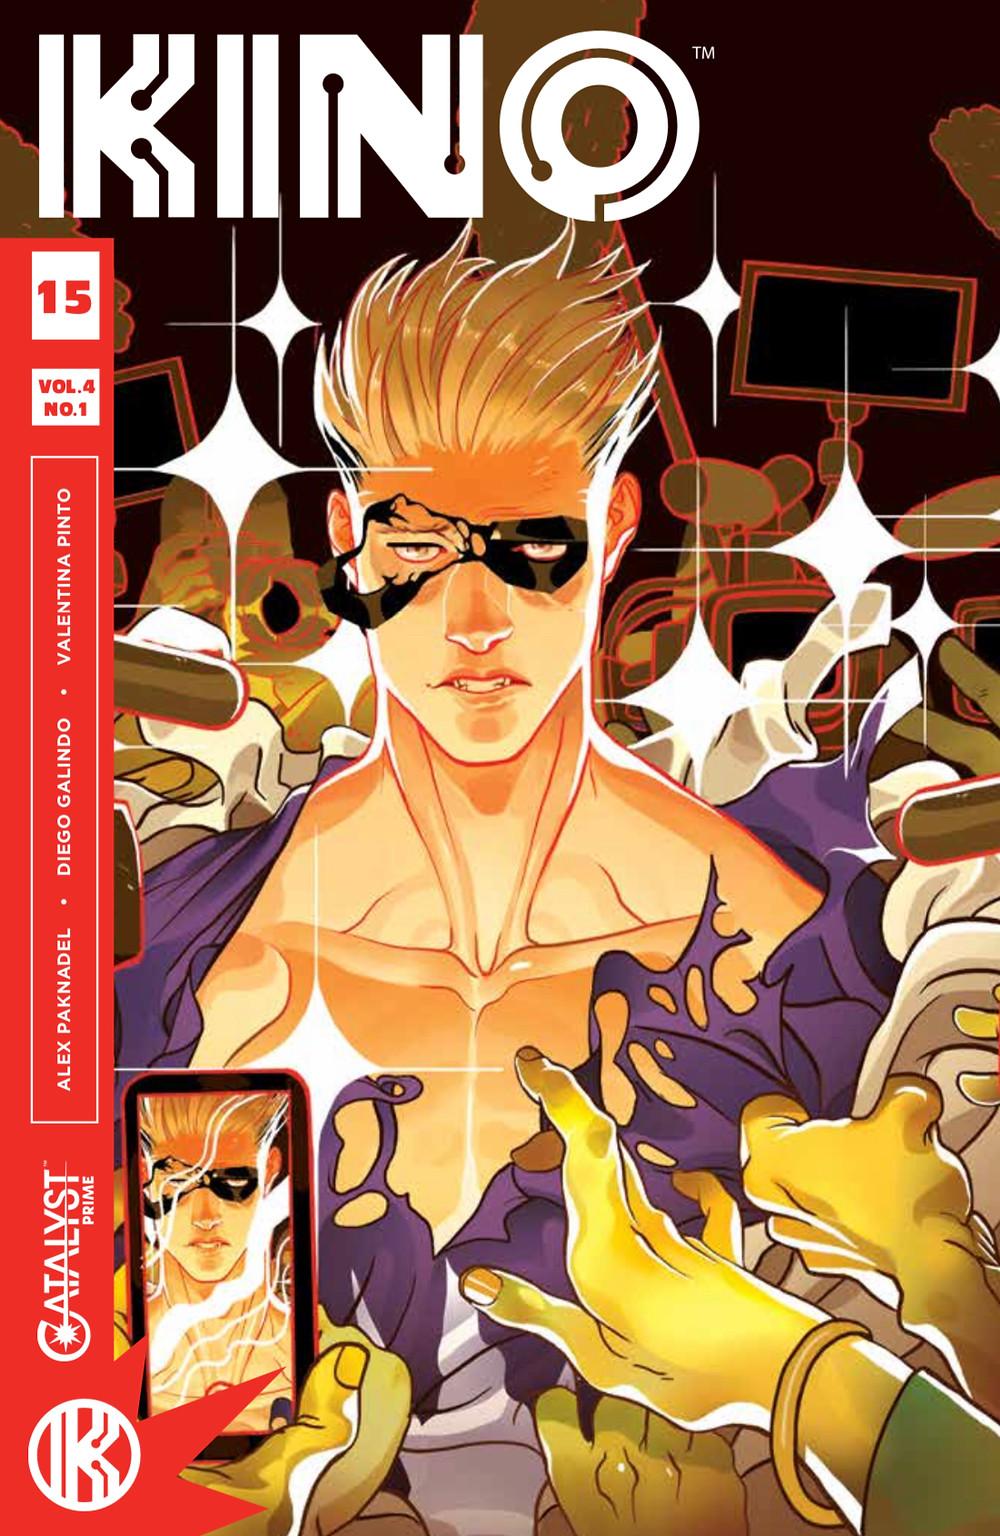 KINO, Issue #15, cover by Baldemar Rivas, Lion Forge, Paknadel/Galindo